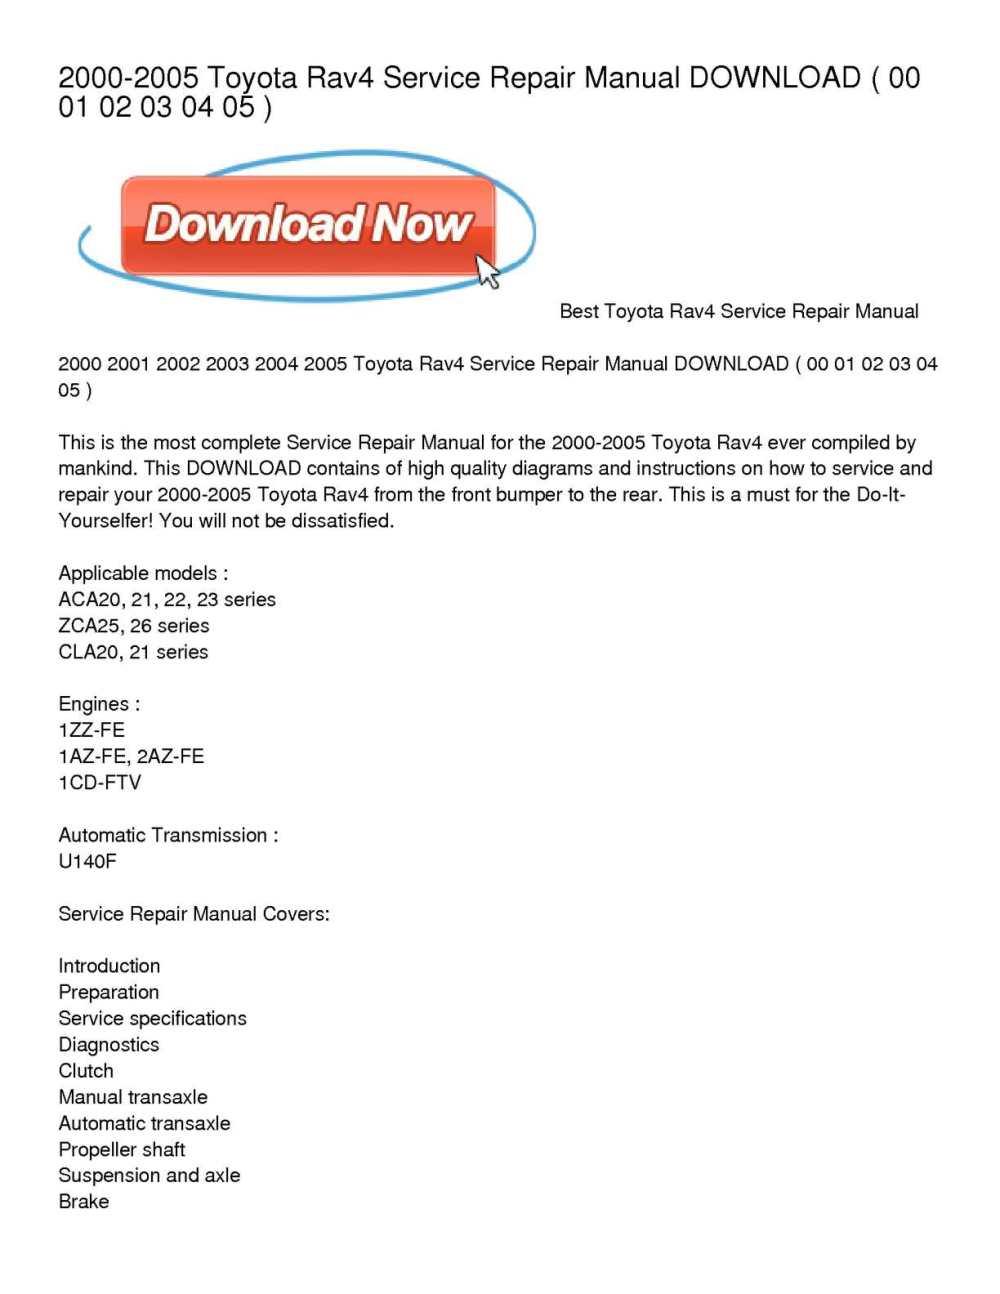 medium resolution of 2000 2005 toyota rav4 service repair manual download